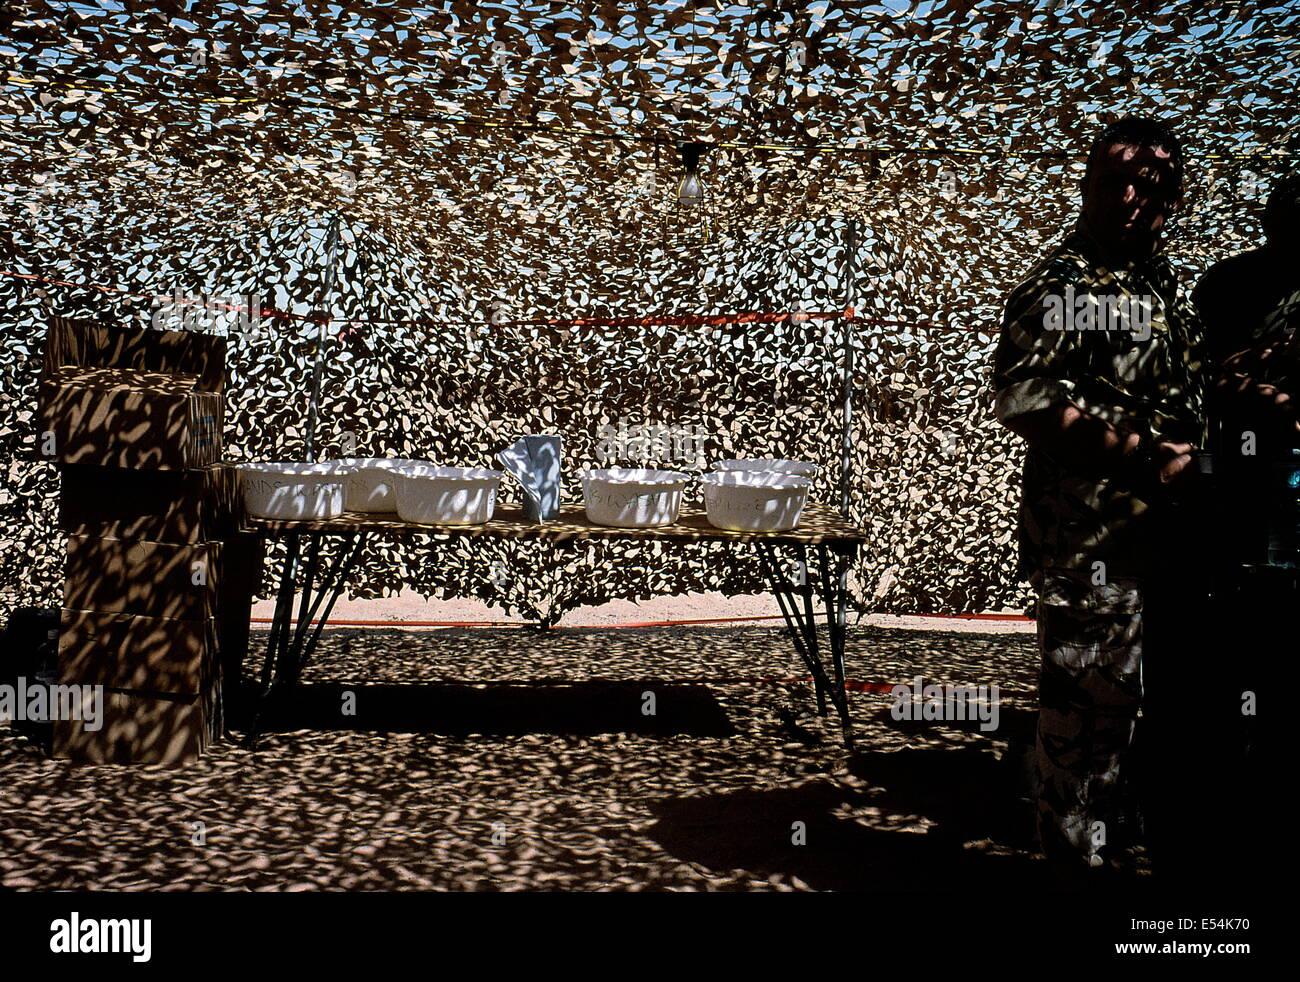 BRITISH MILITARY CAMP, DESERT, OMAN. - DESERT CAMOUFLAGE NETTING. PHOTO:JONATHAN EASTLAND/AJAX - Stock Image